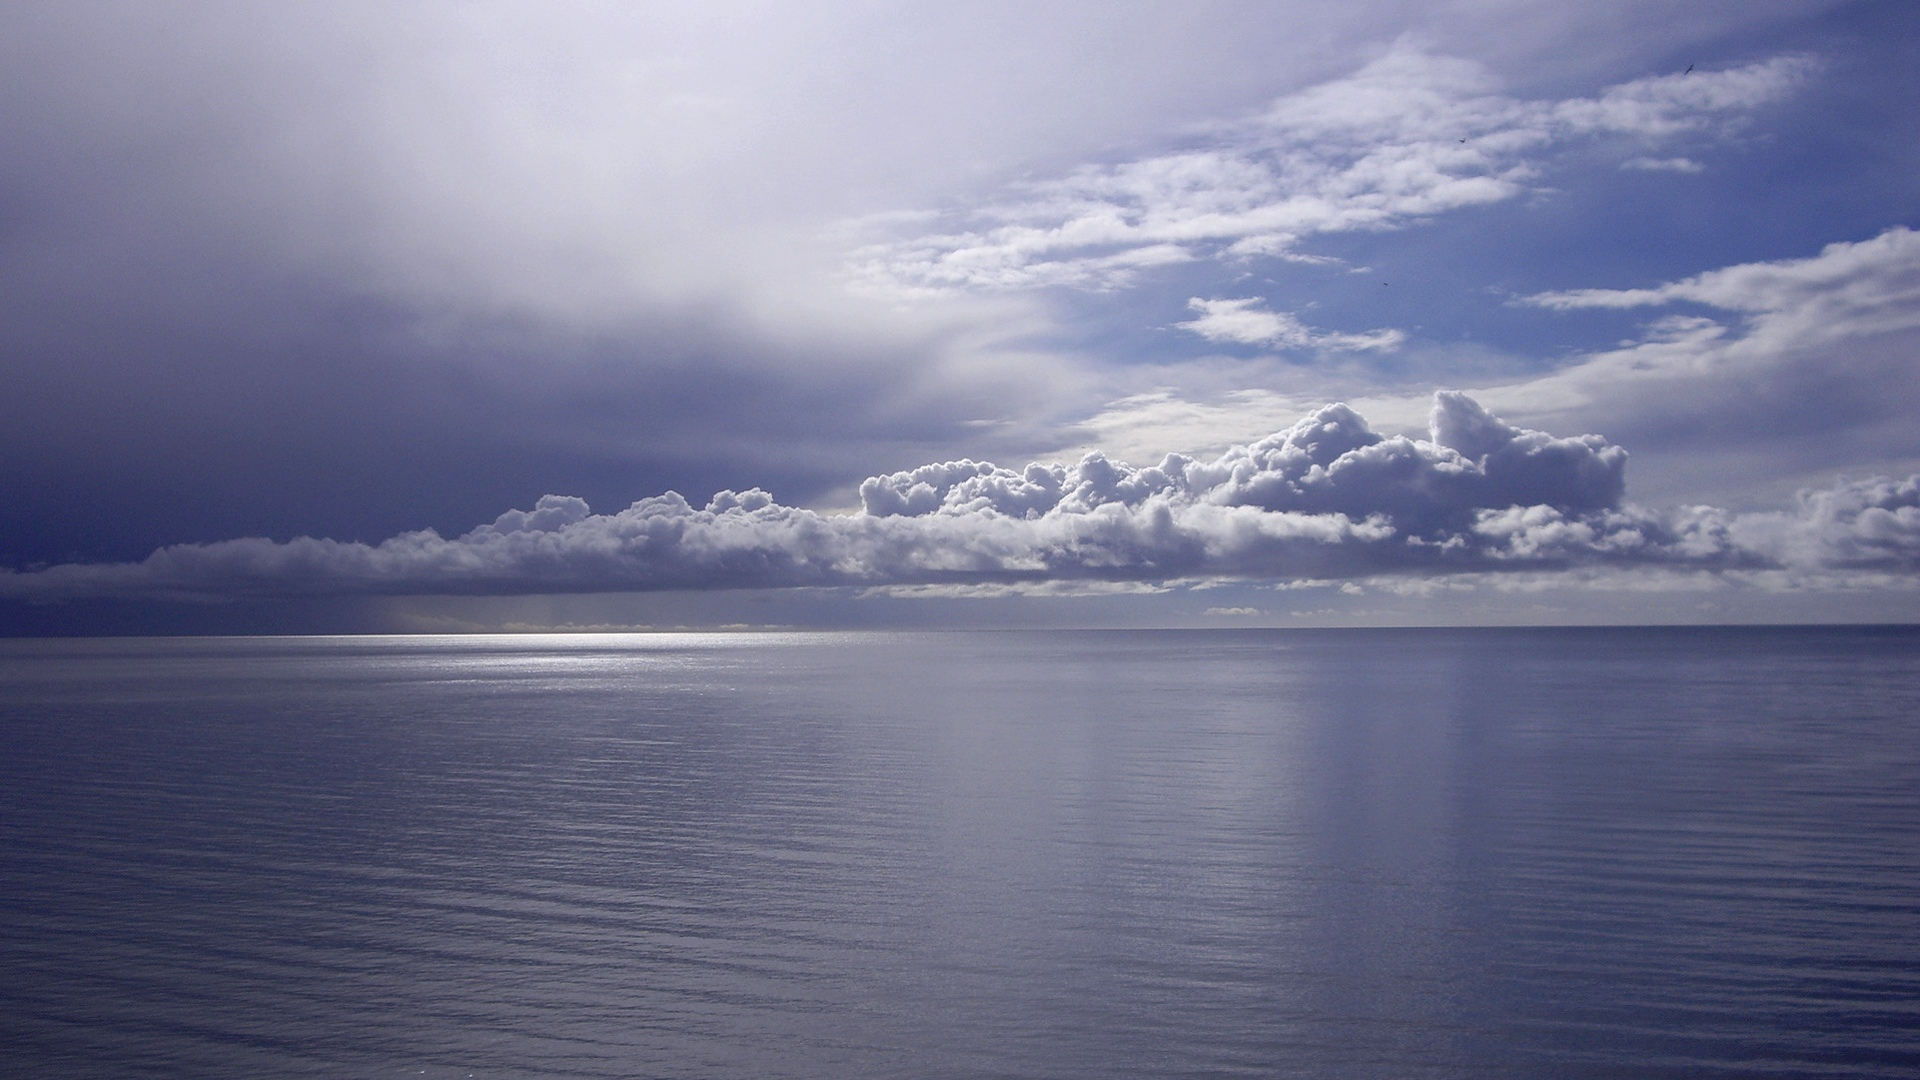 Water Ocean Wallpaper 1920x1080 Water Ocean Clouds Seascapes 1920x1080